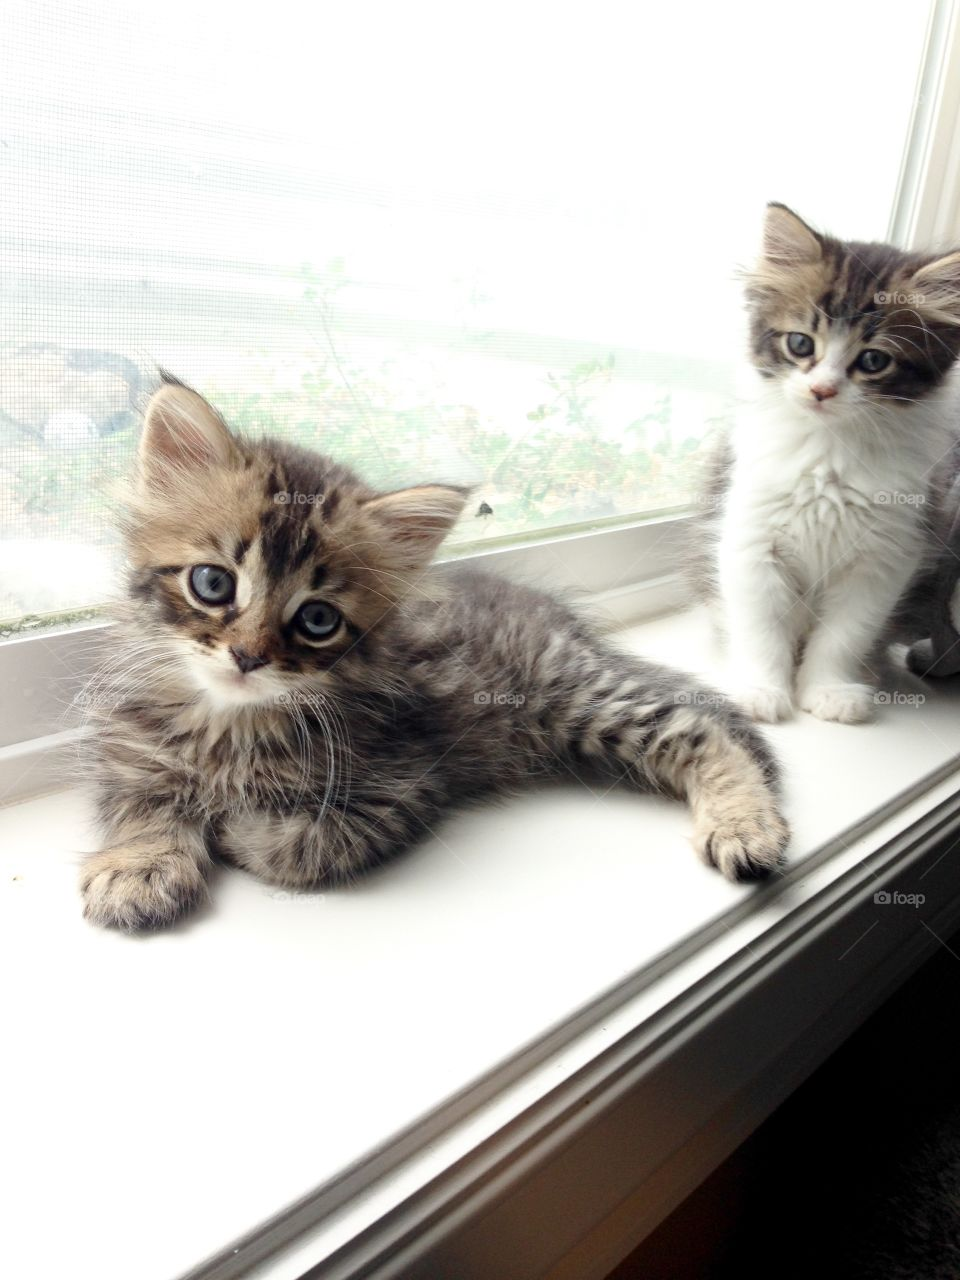 Baby kitties